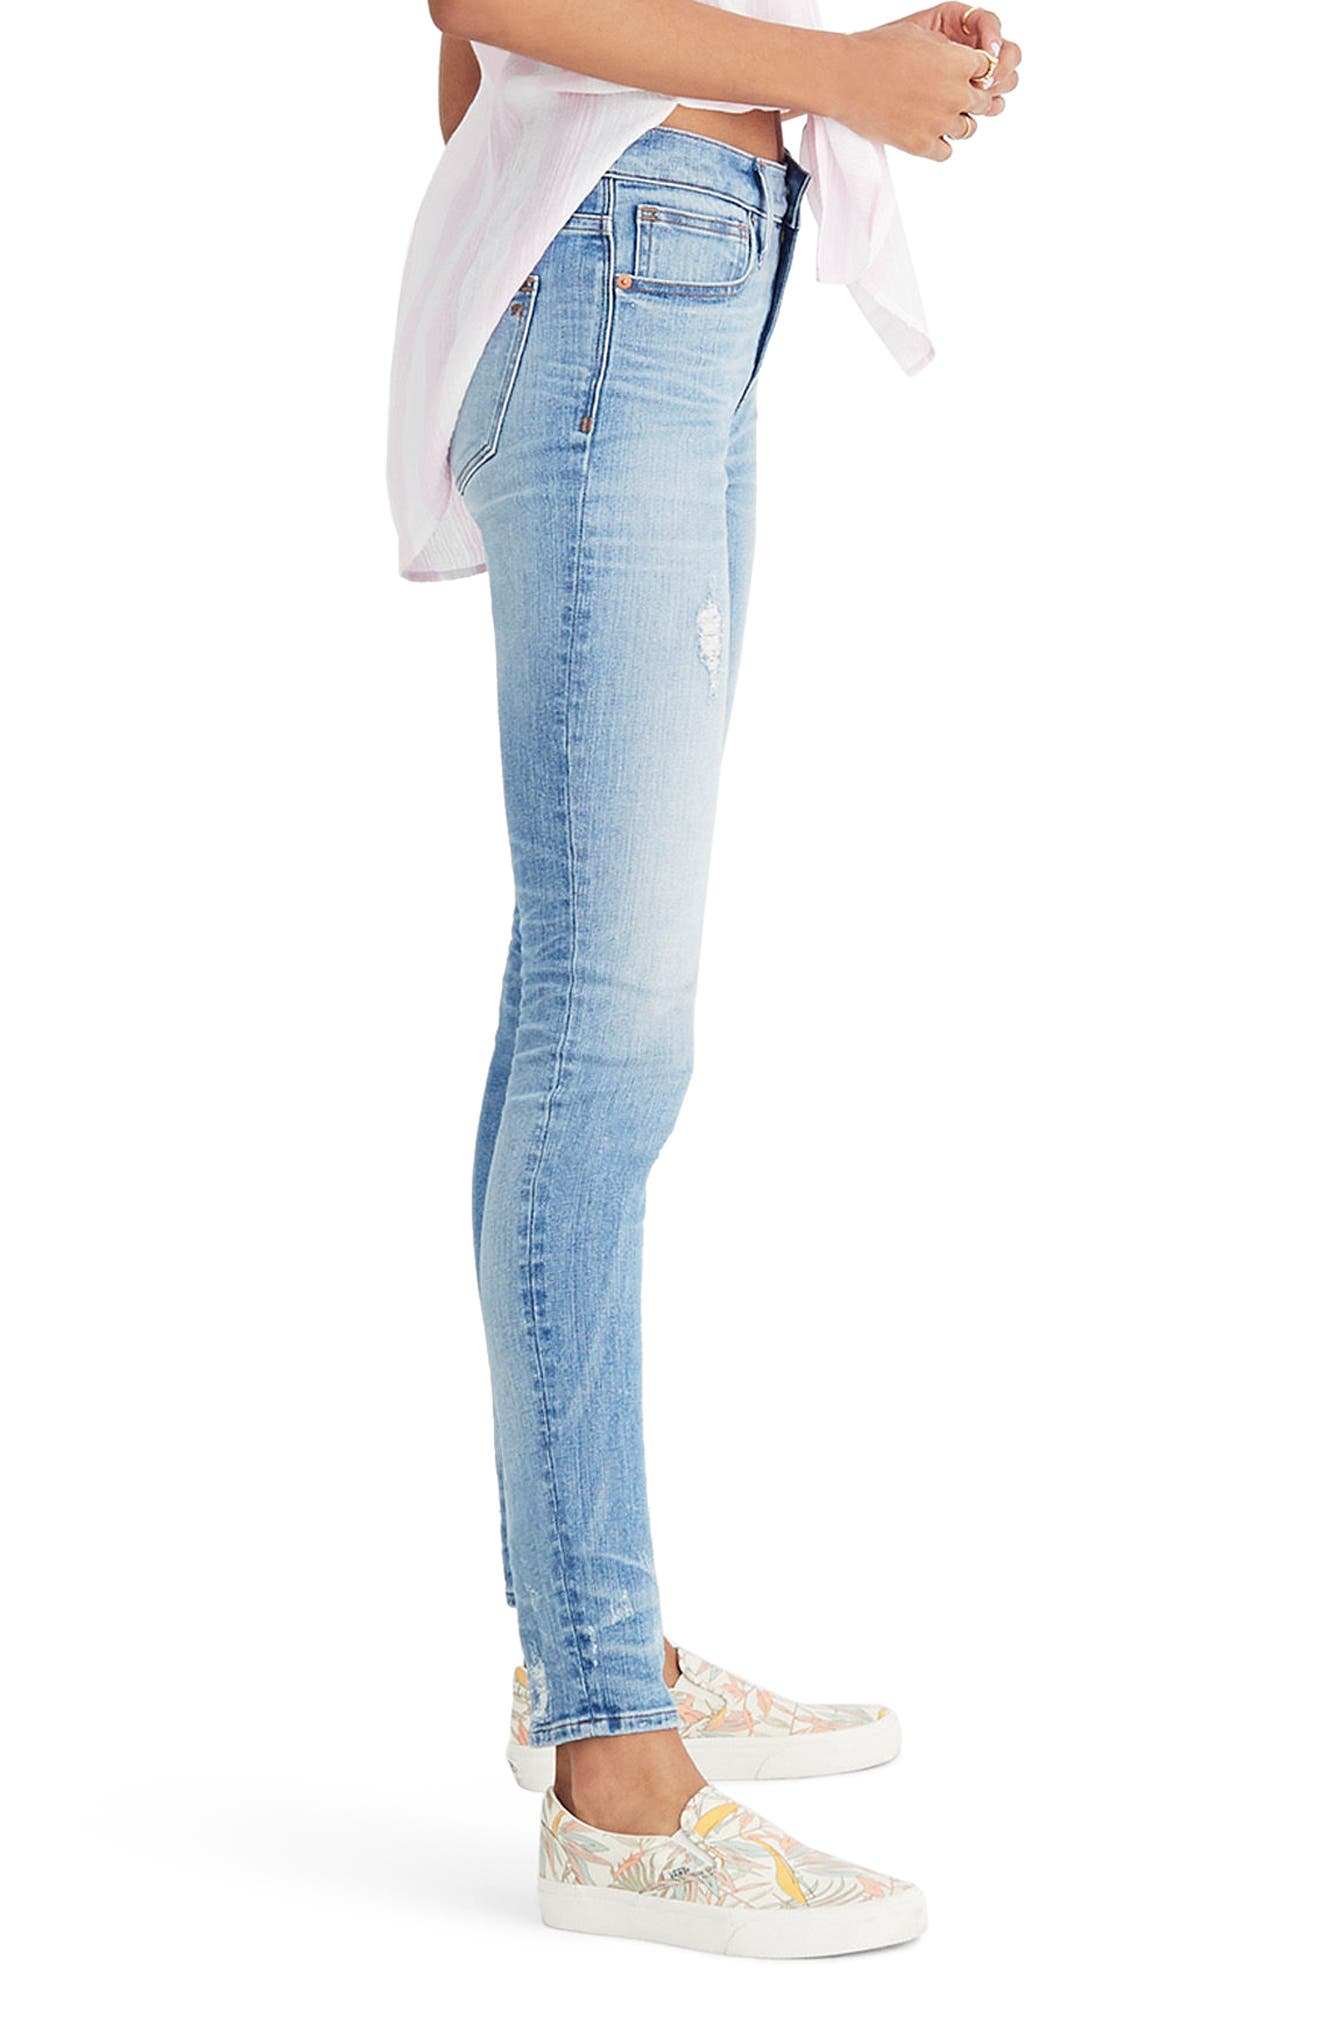 9-Inch Destructed Hem High Waist Skinny Jeans,                             Alternate thumbnail 3, color,                             Cliff Wash